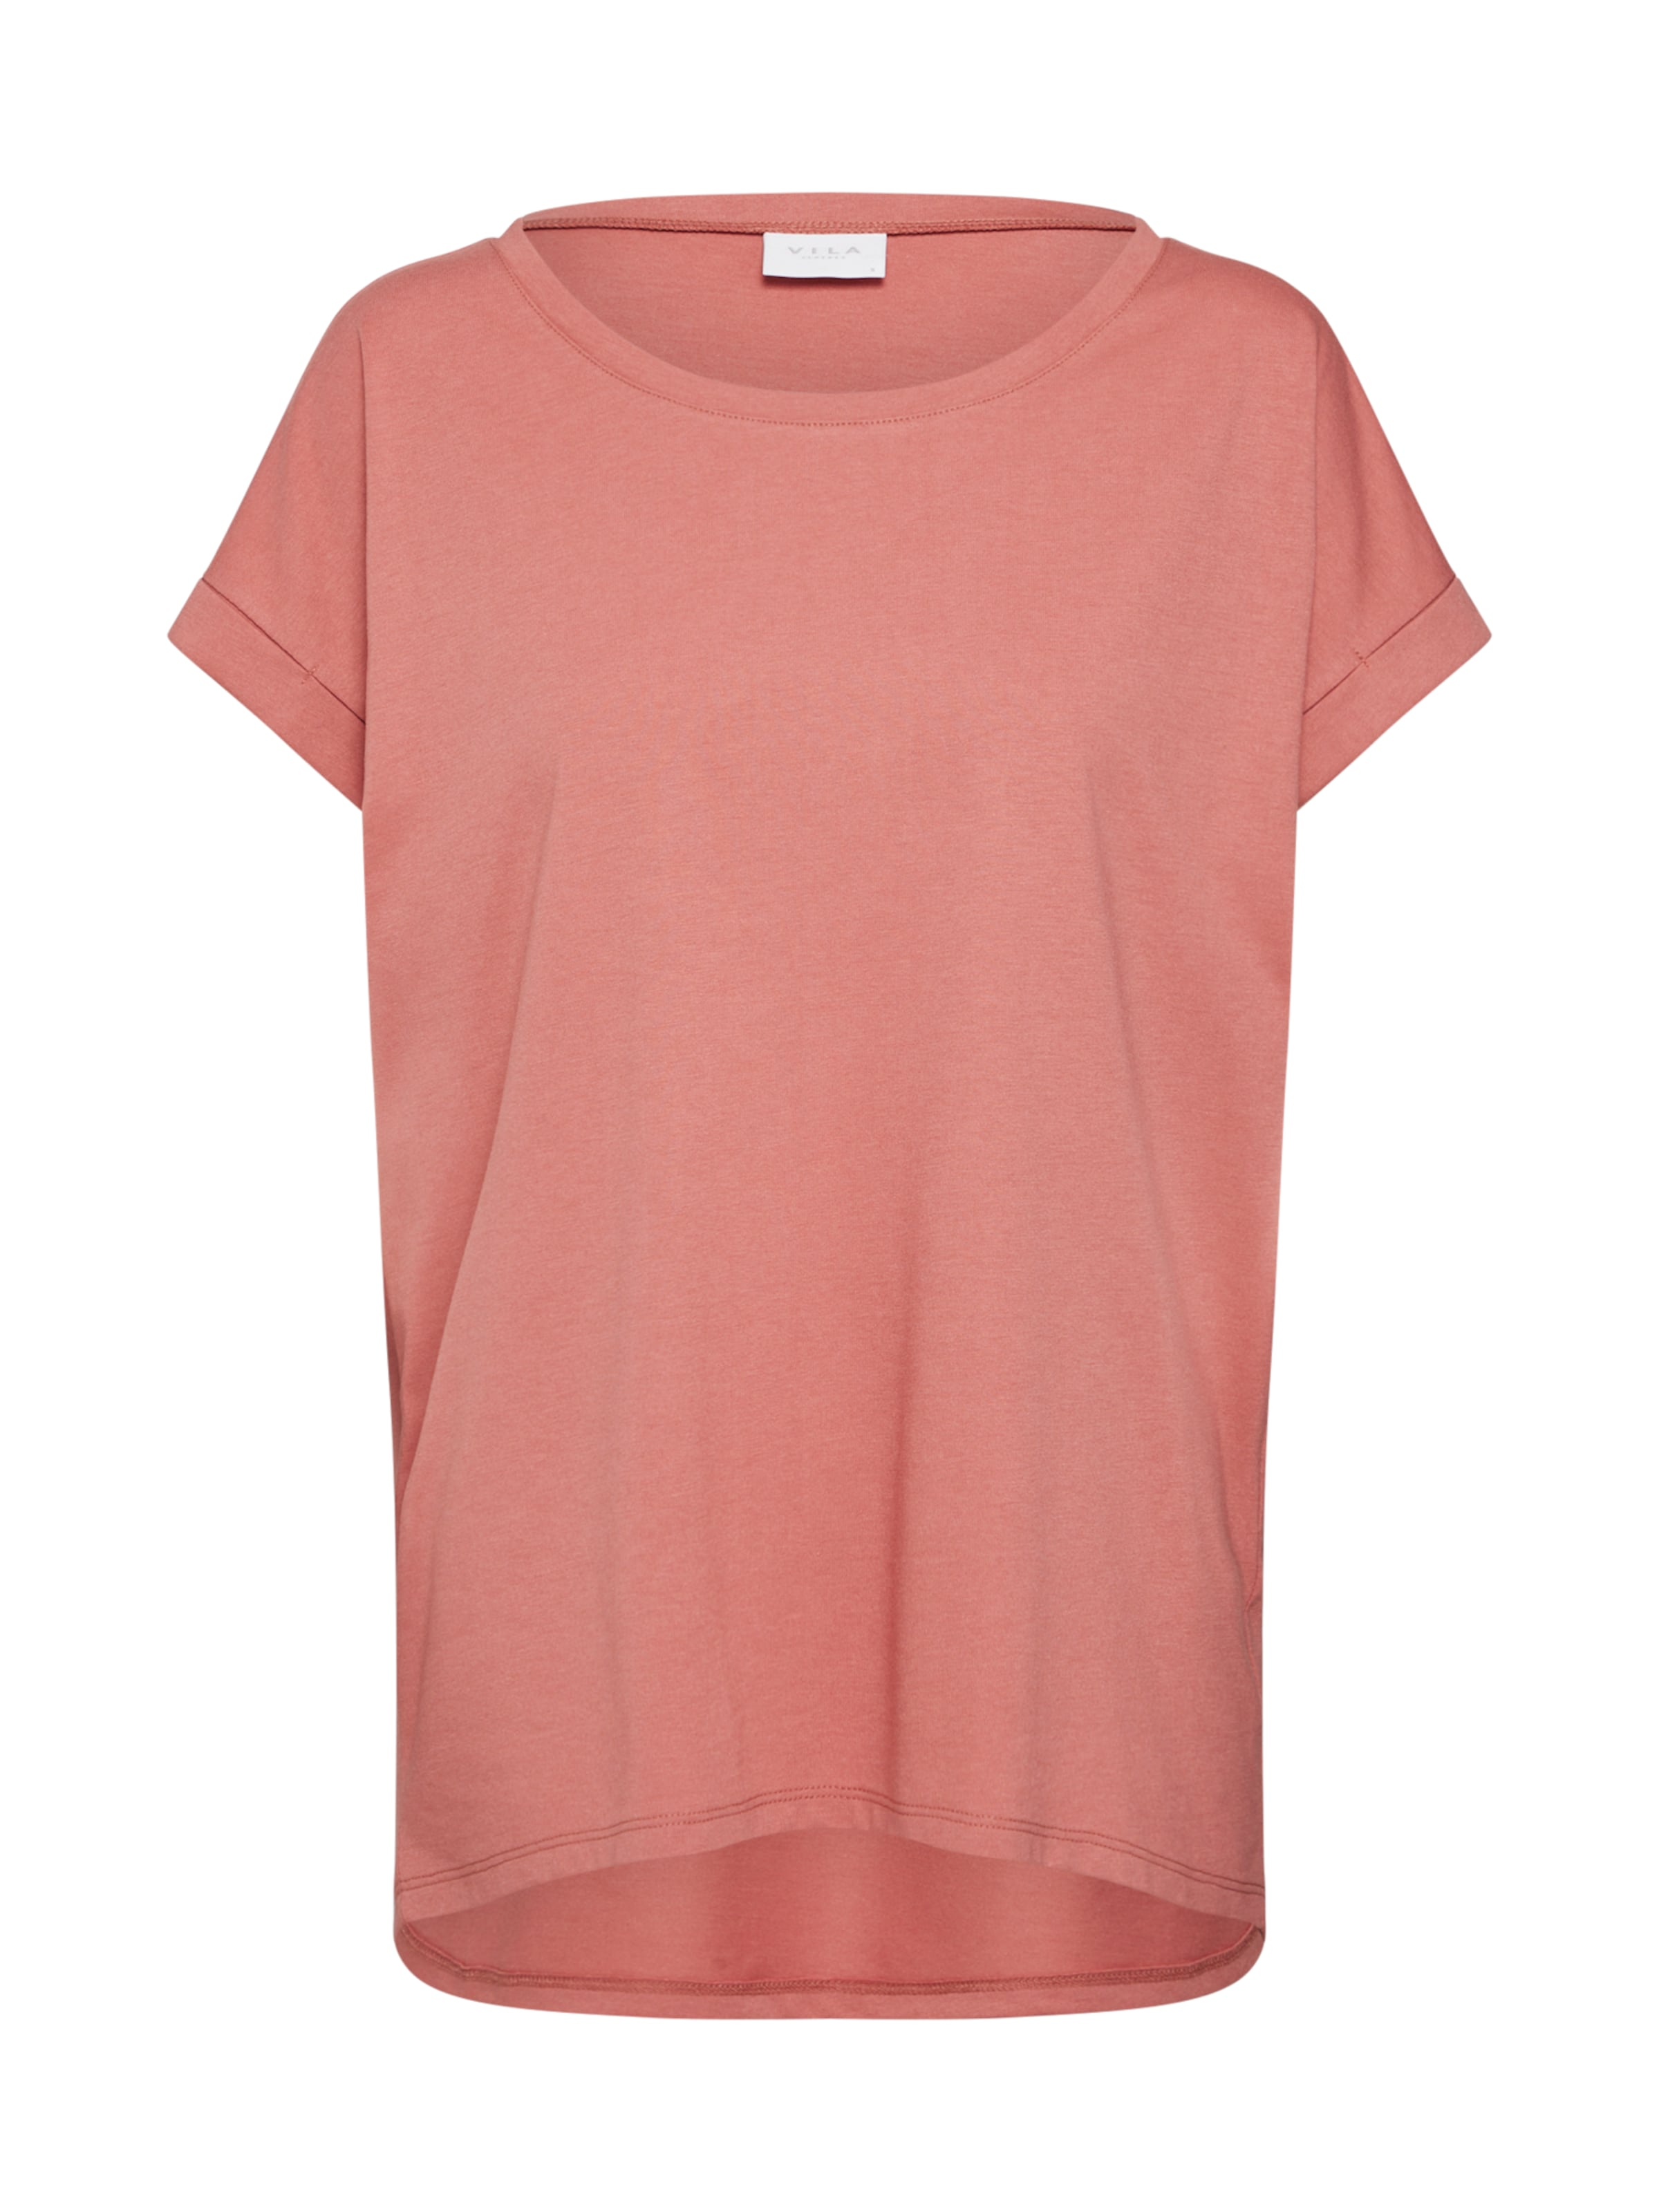 Rosé 'dreamers' T Vila shirt En wnP80OkX